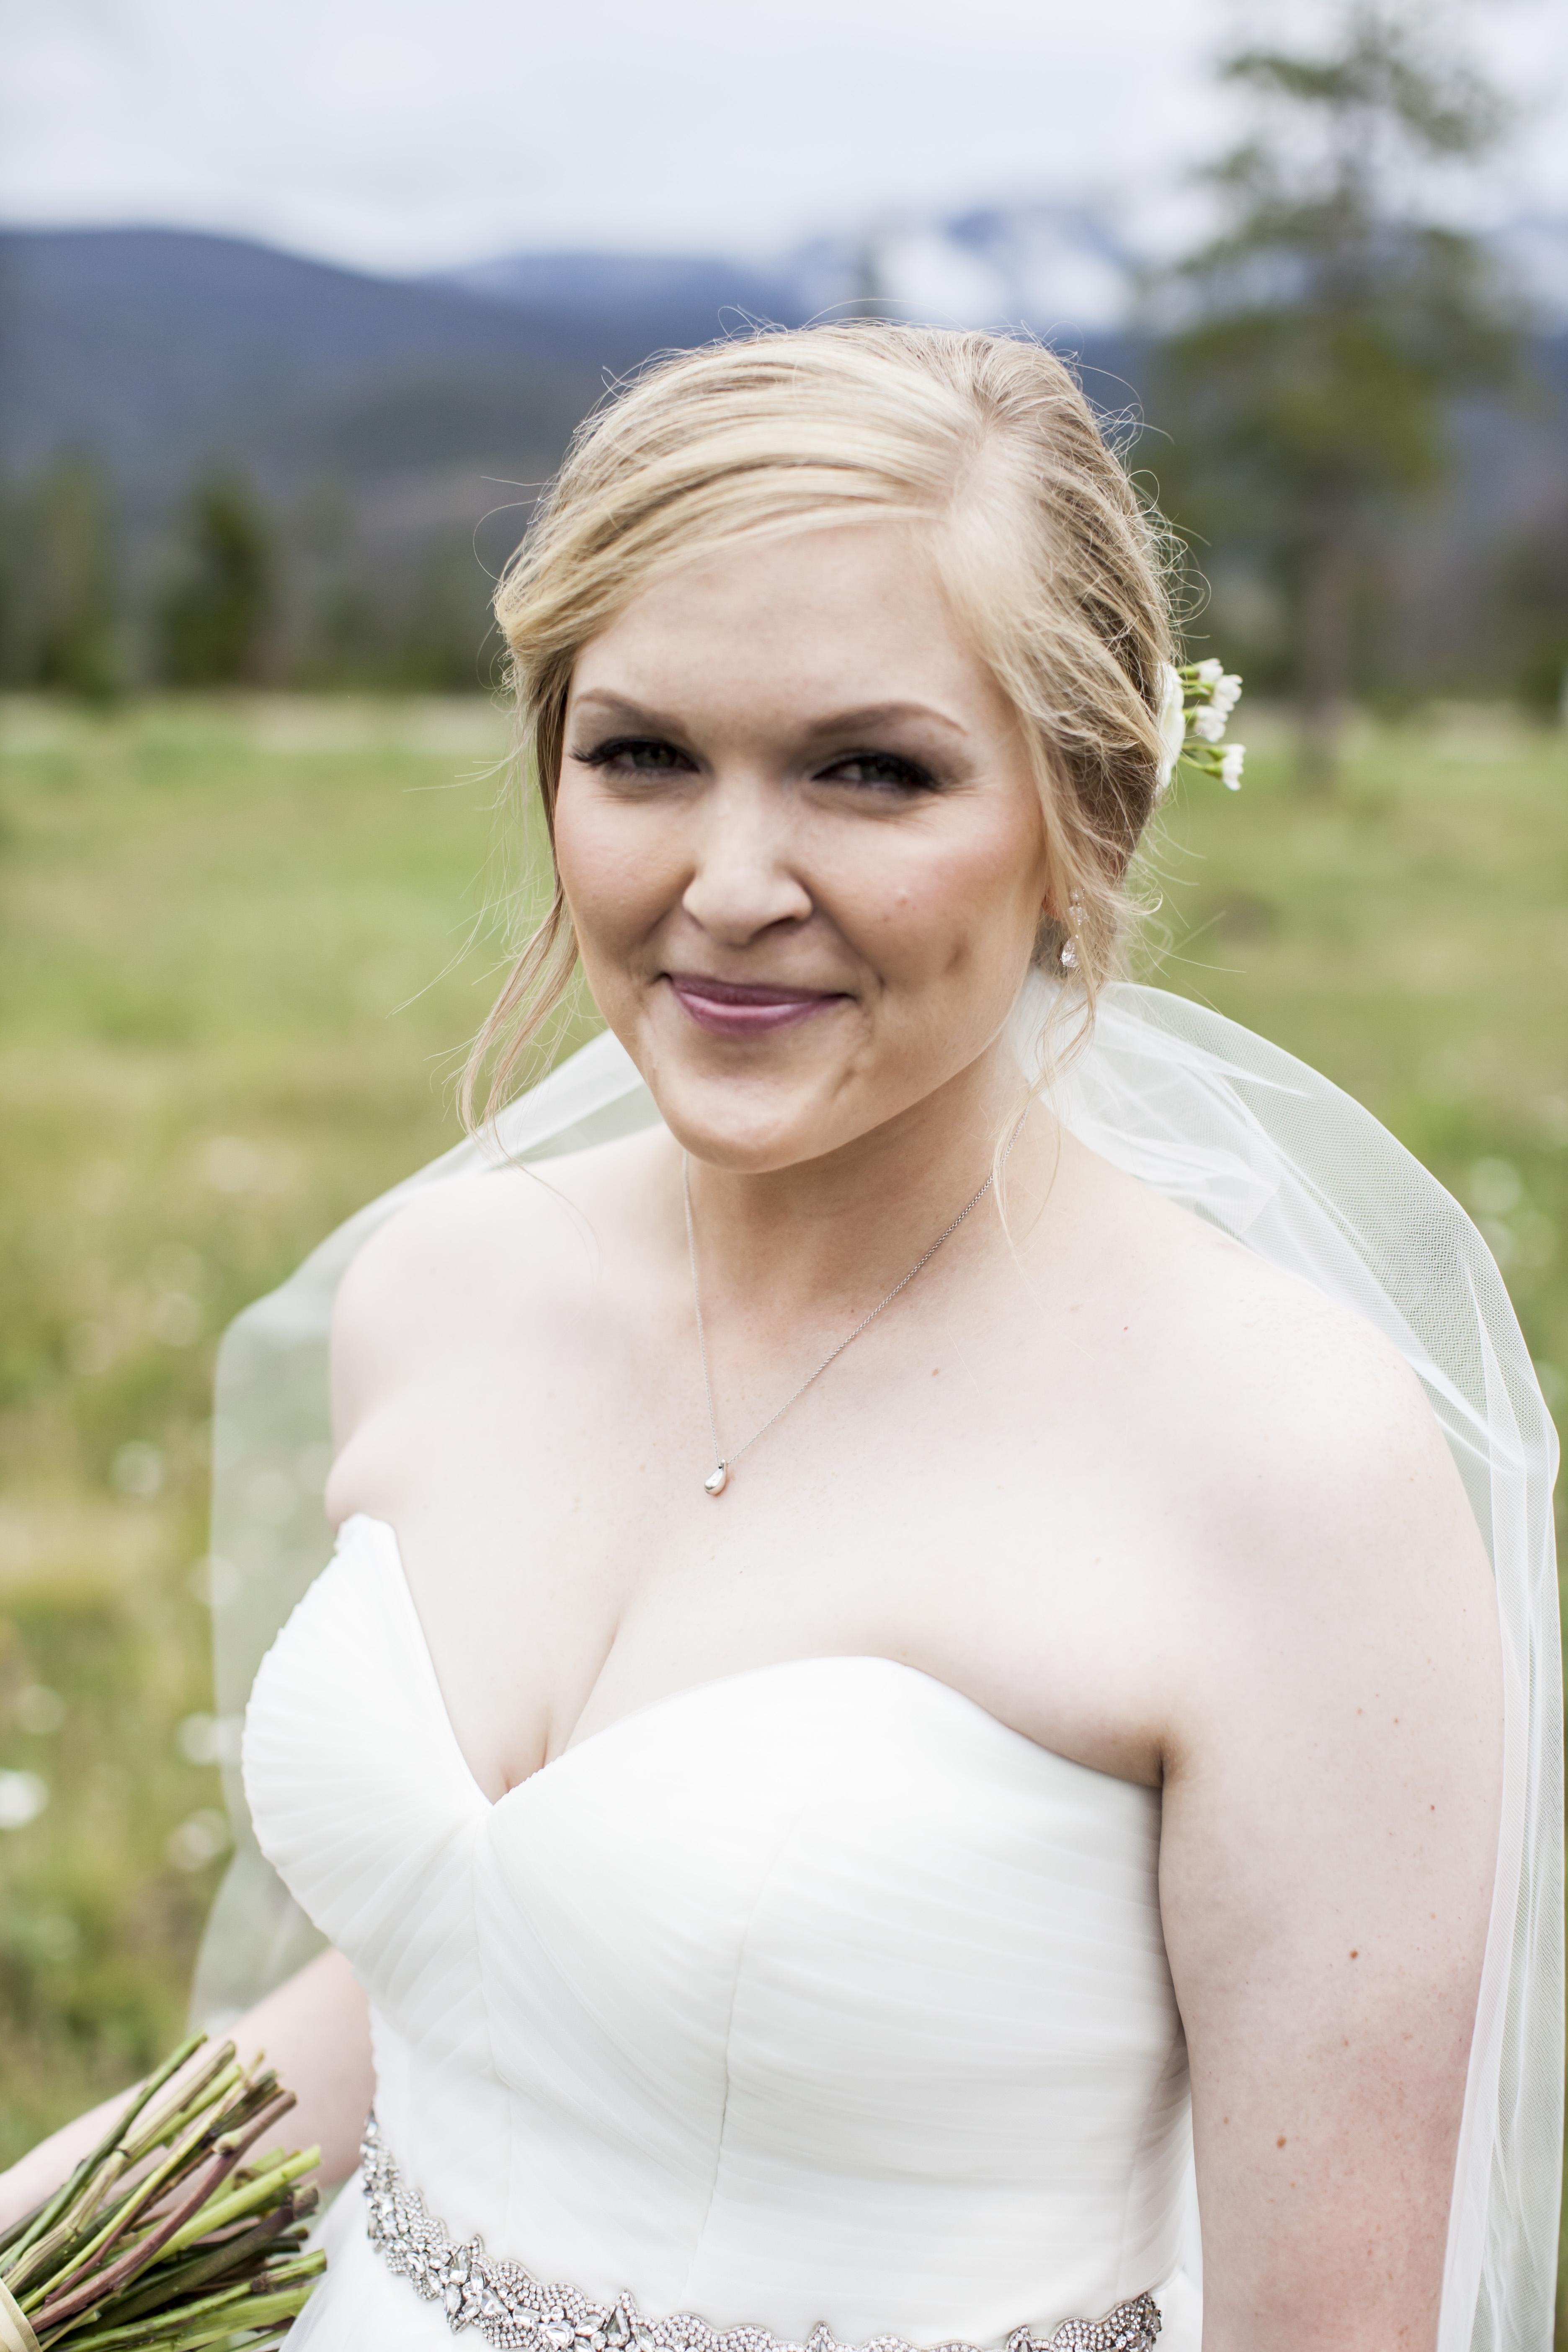 denver wedding makeup artist | wedlocks bridal hair & makeup